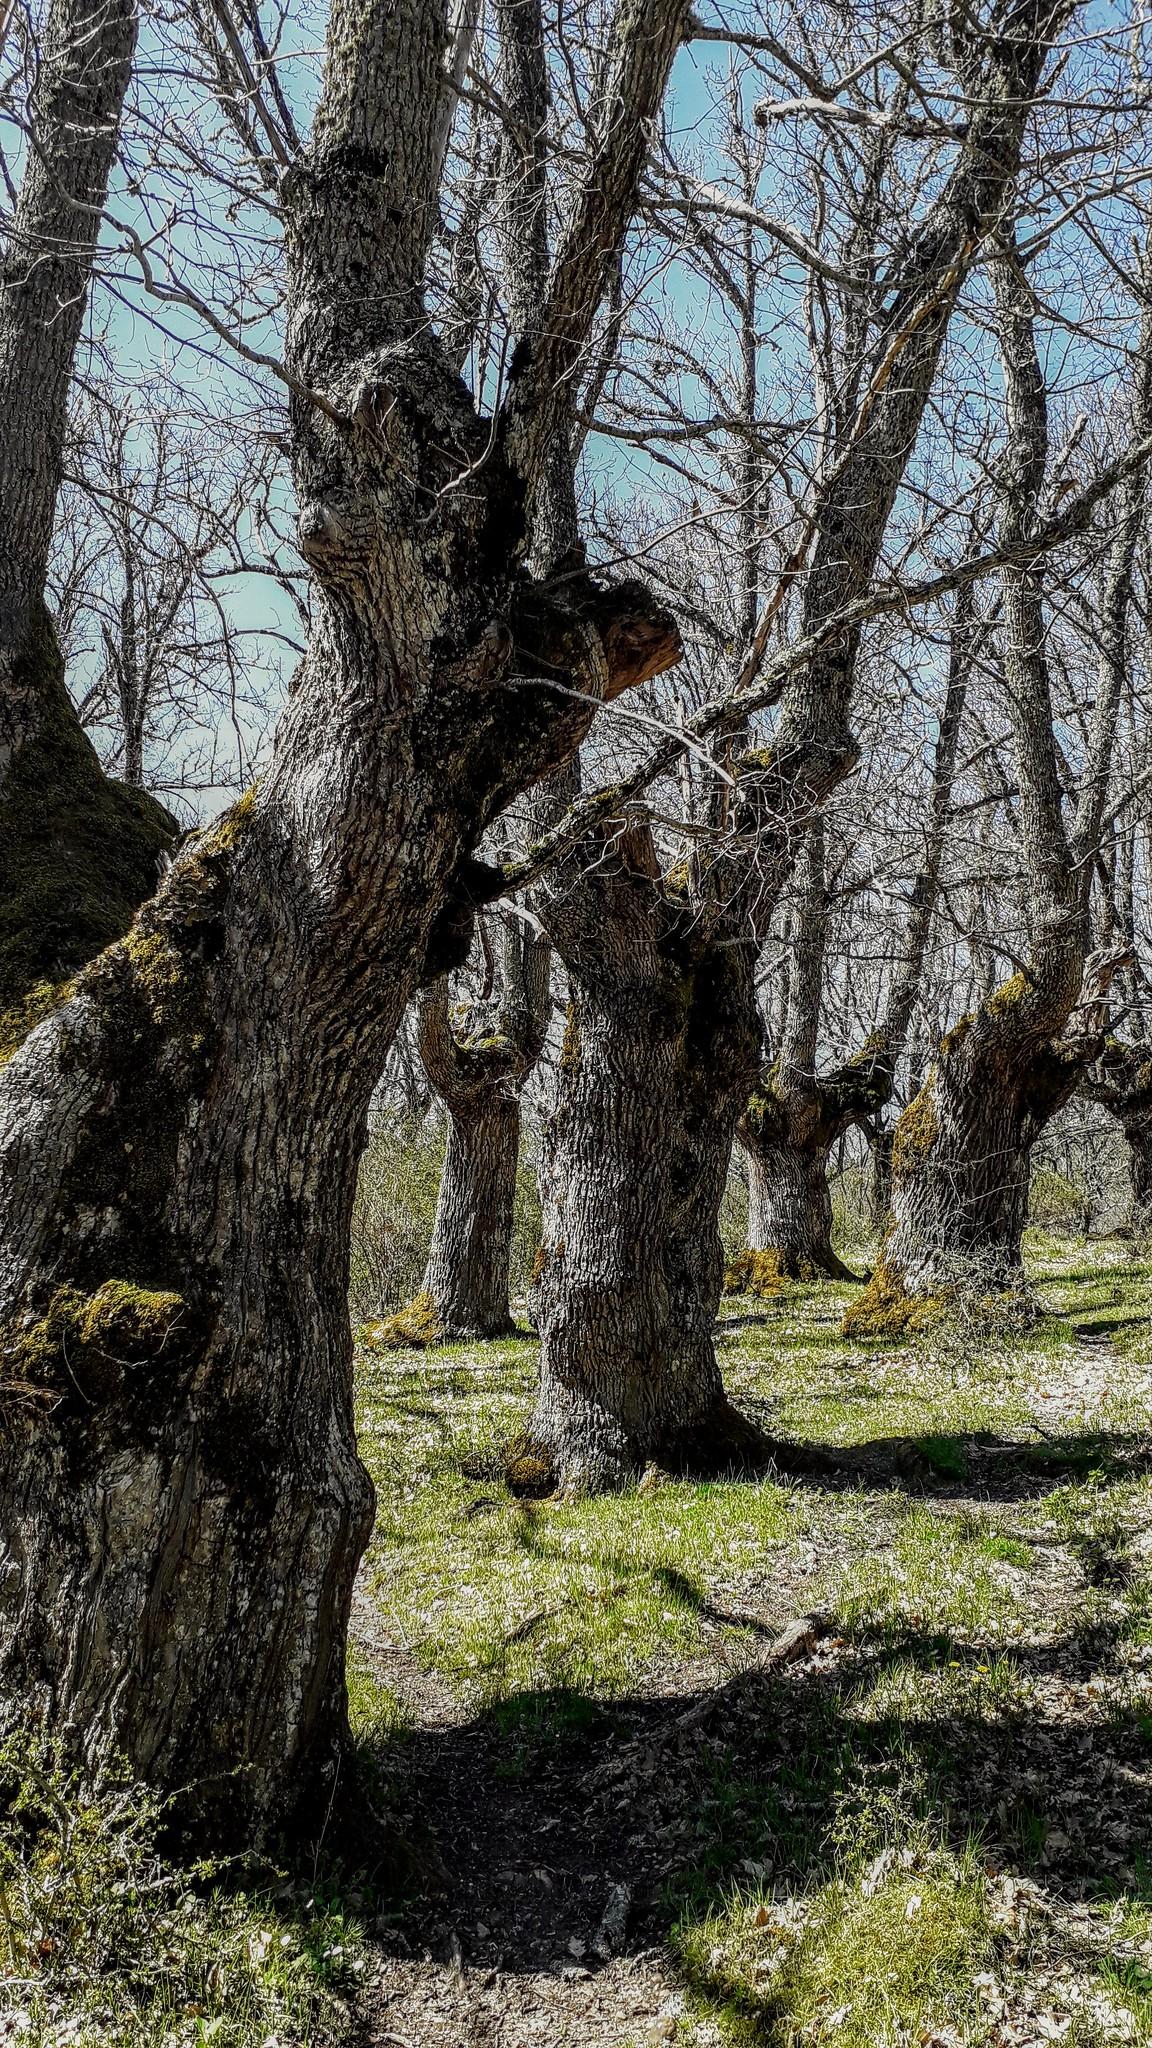 Palacios de la Sierra (Burgos). Robledal (Quercus petraea).